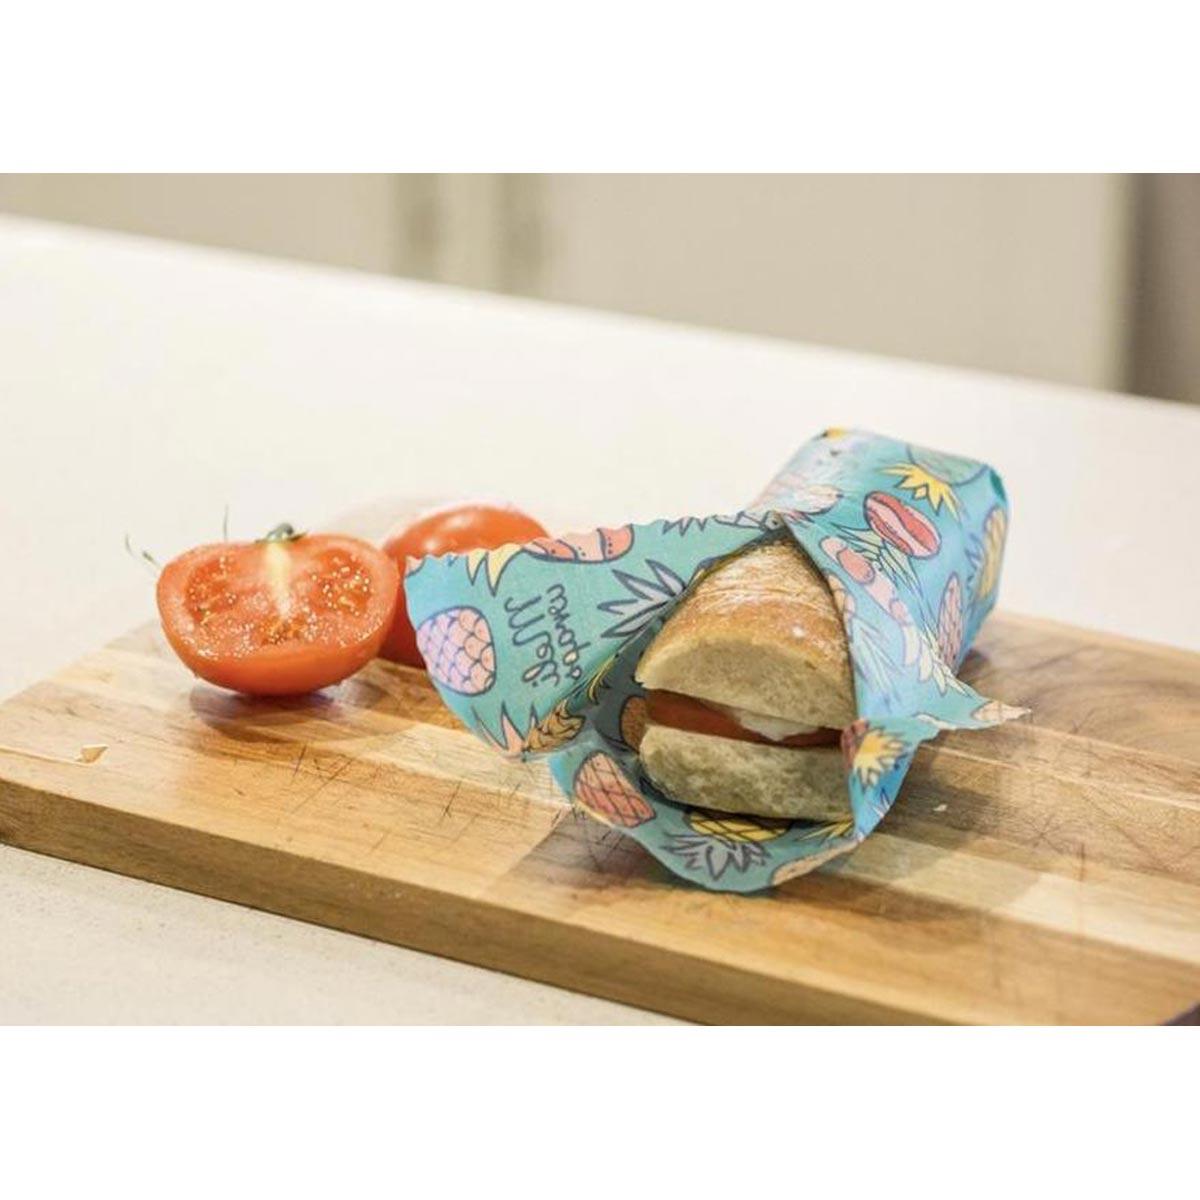 Meli Wraps 3-Pack (Sm/Med/Lrg) Reusable Beeswax Food Wrap, Pineapple Print